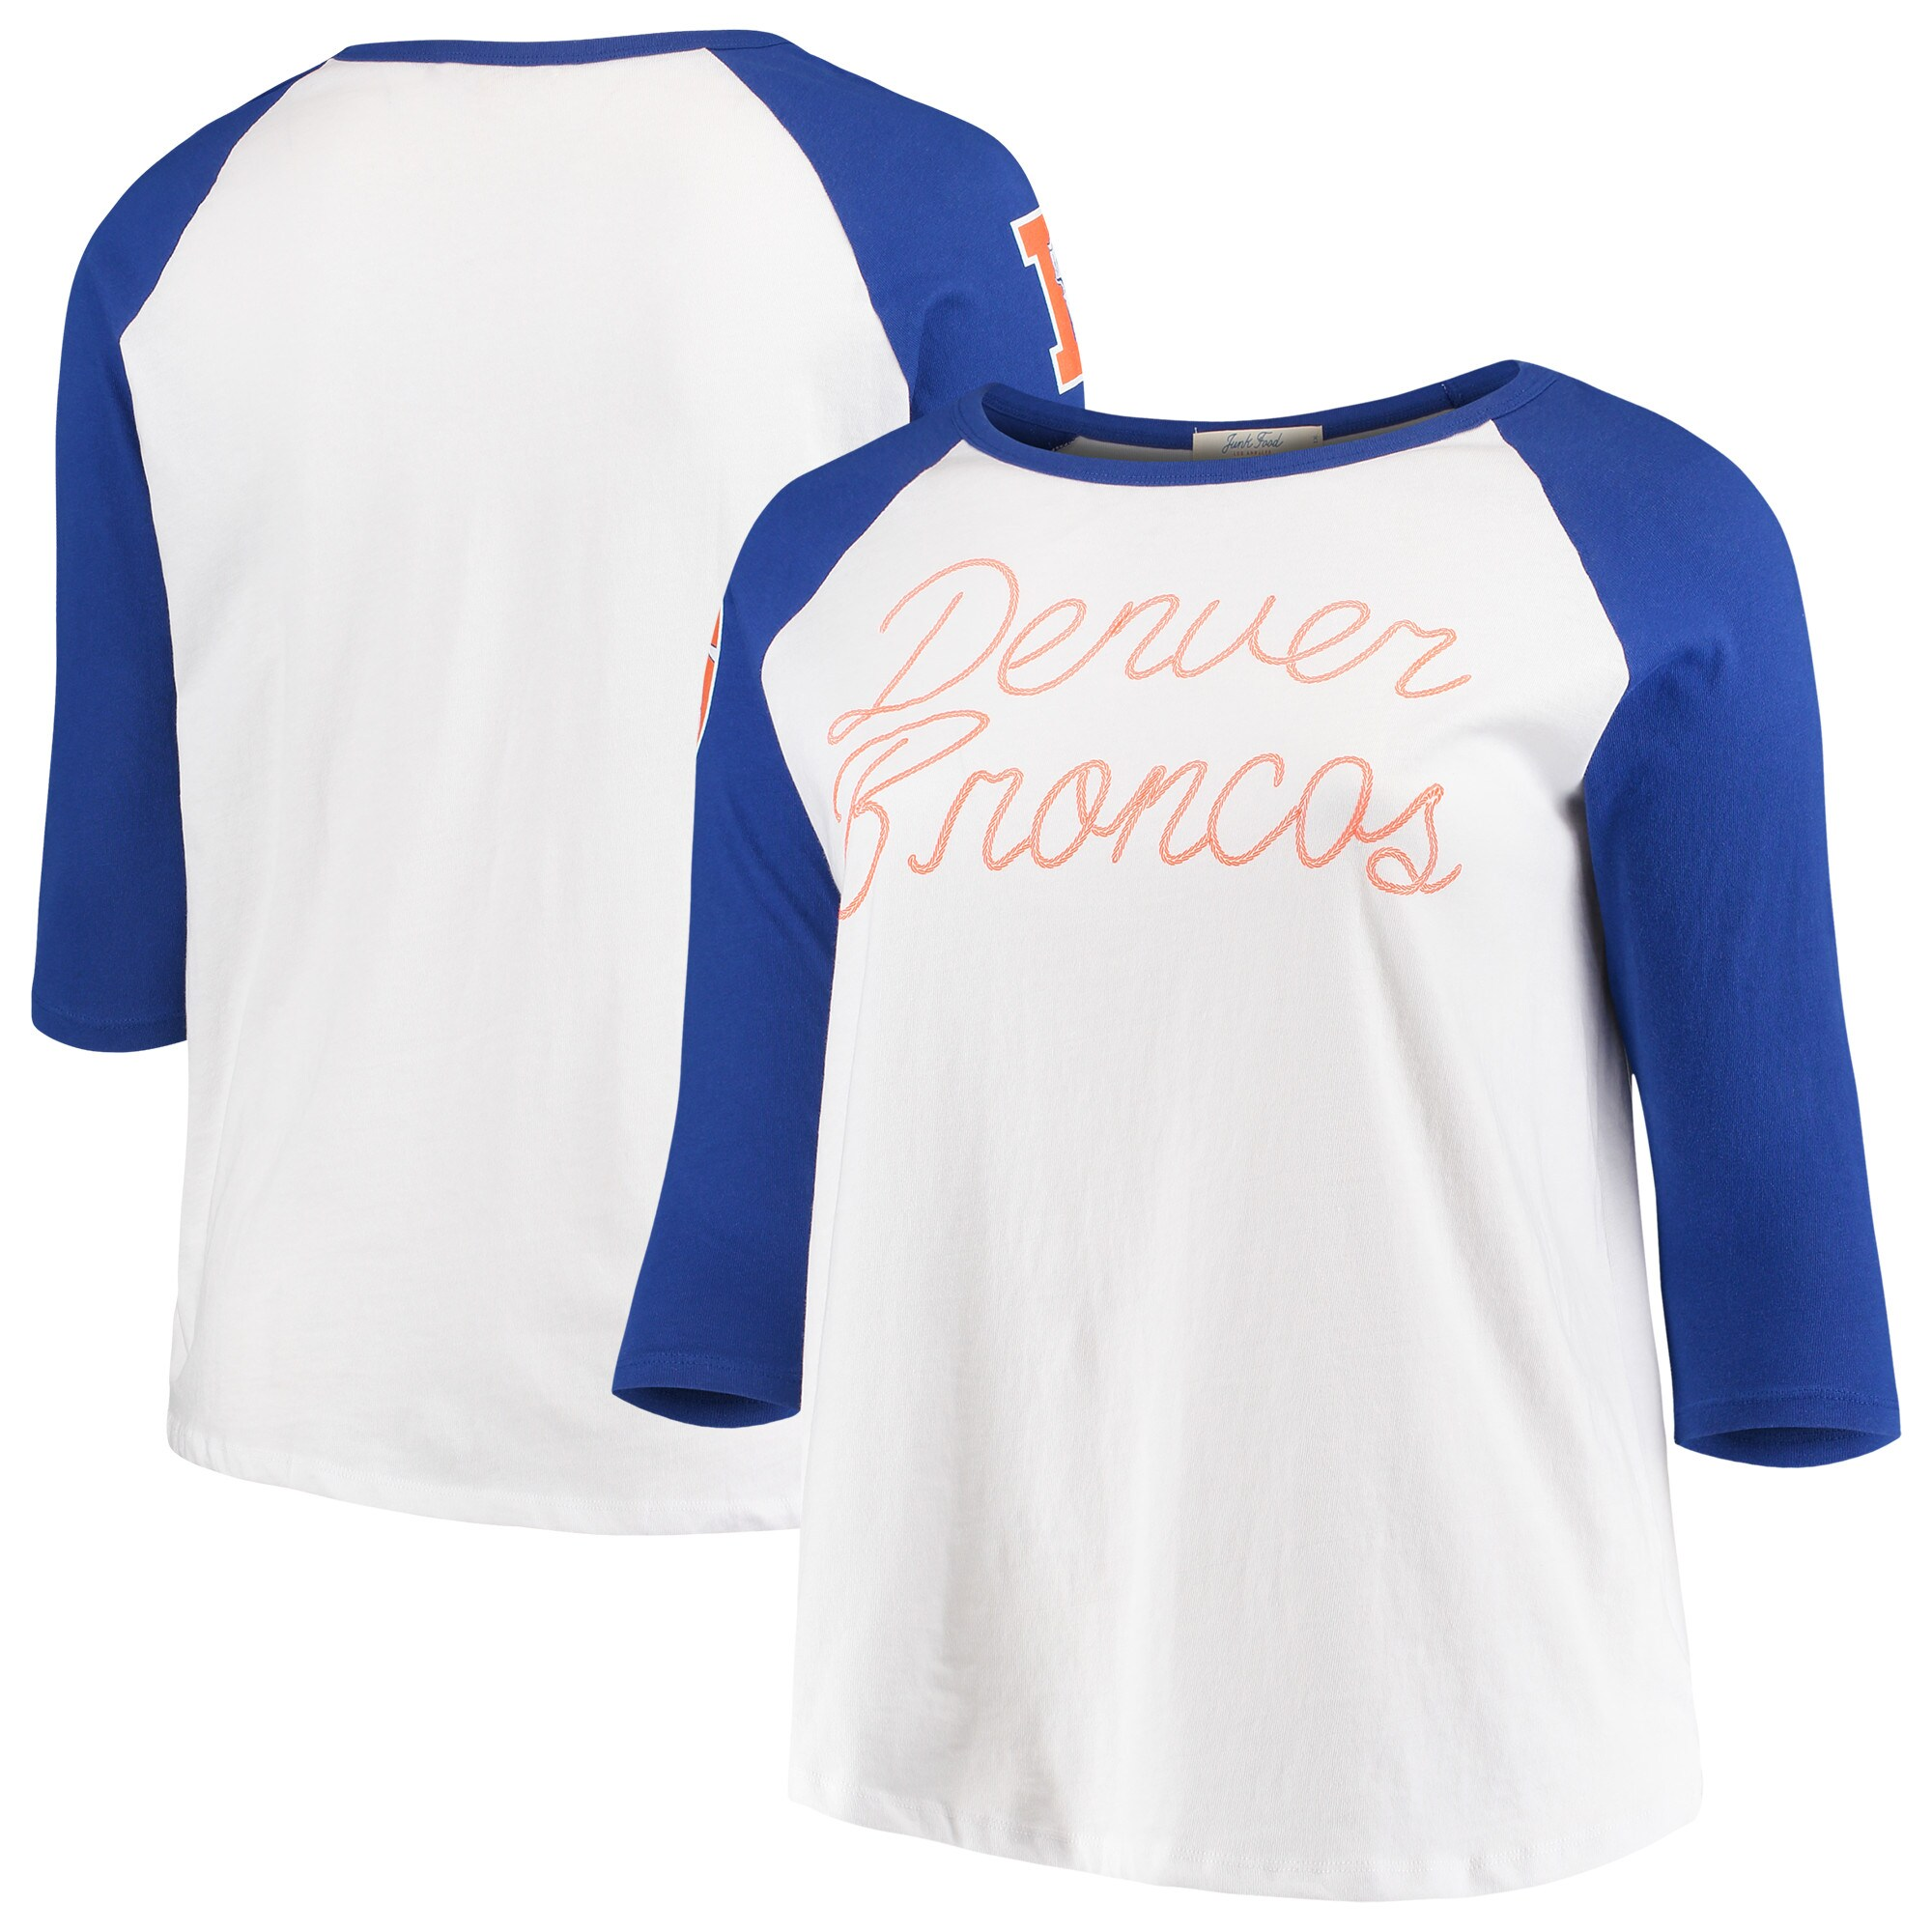 Denver Broncos Junk Food Women's Plus Size Raglan 3/4-Sleeve T-Shirt - White/Royal